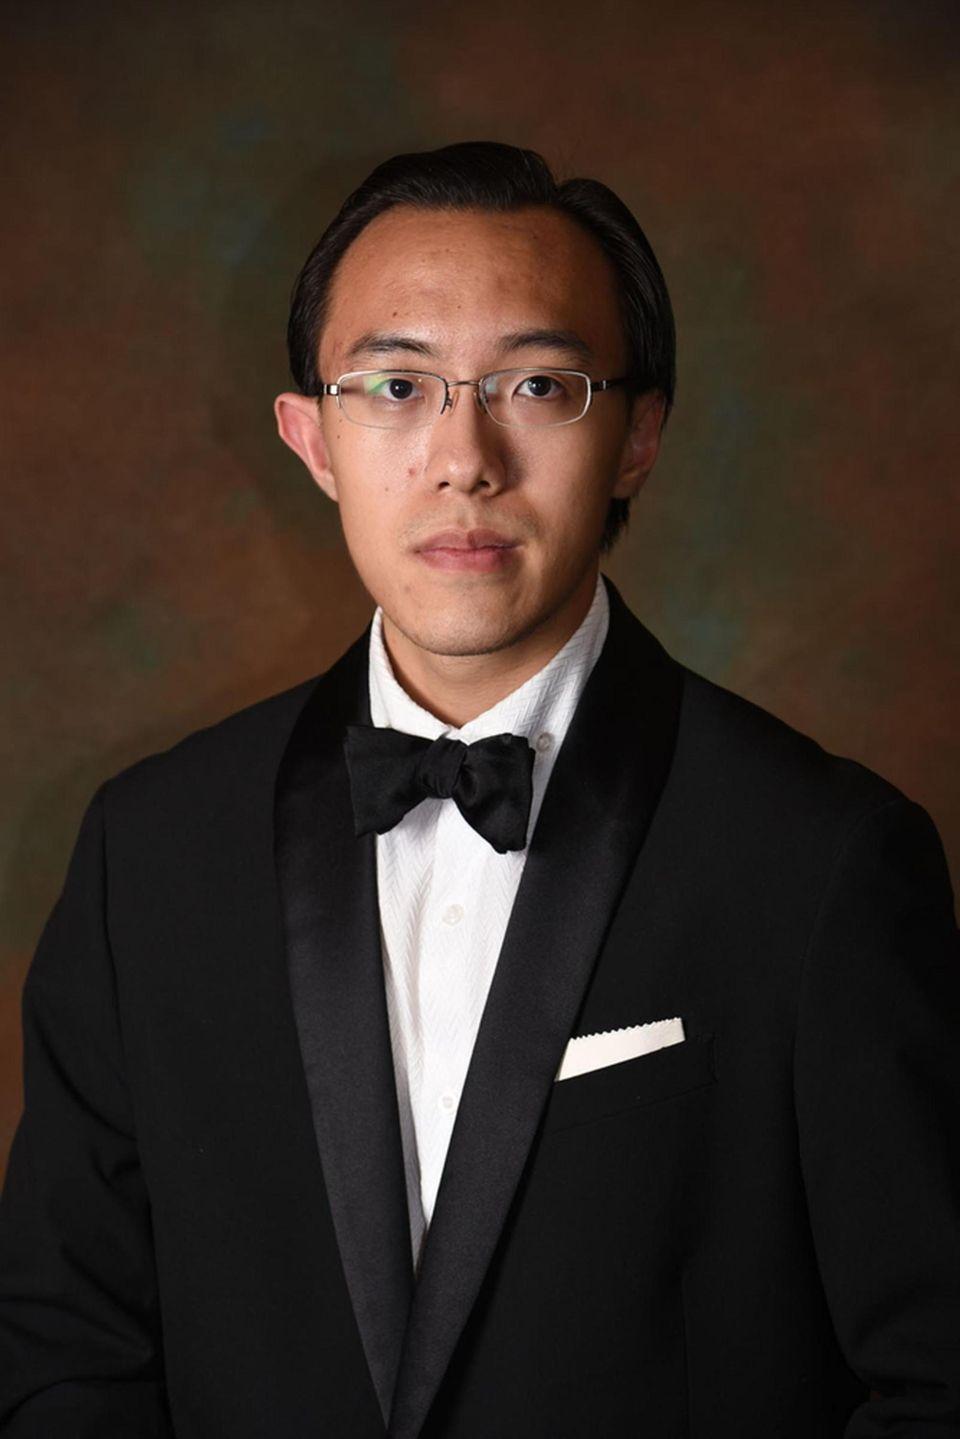 Syosset High School's Siyu Yang believes playing music